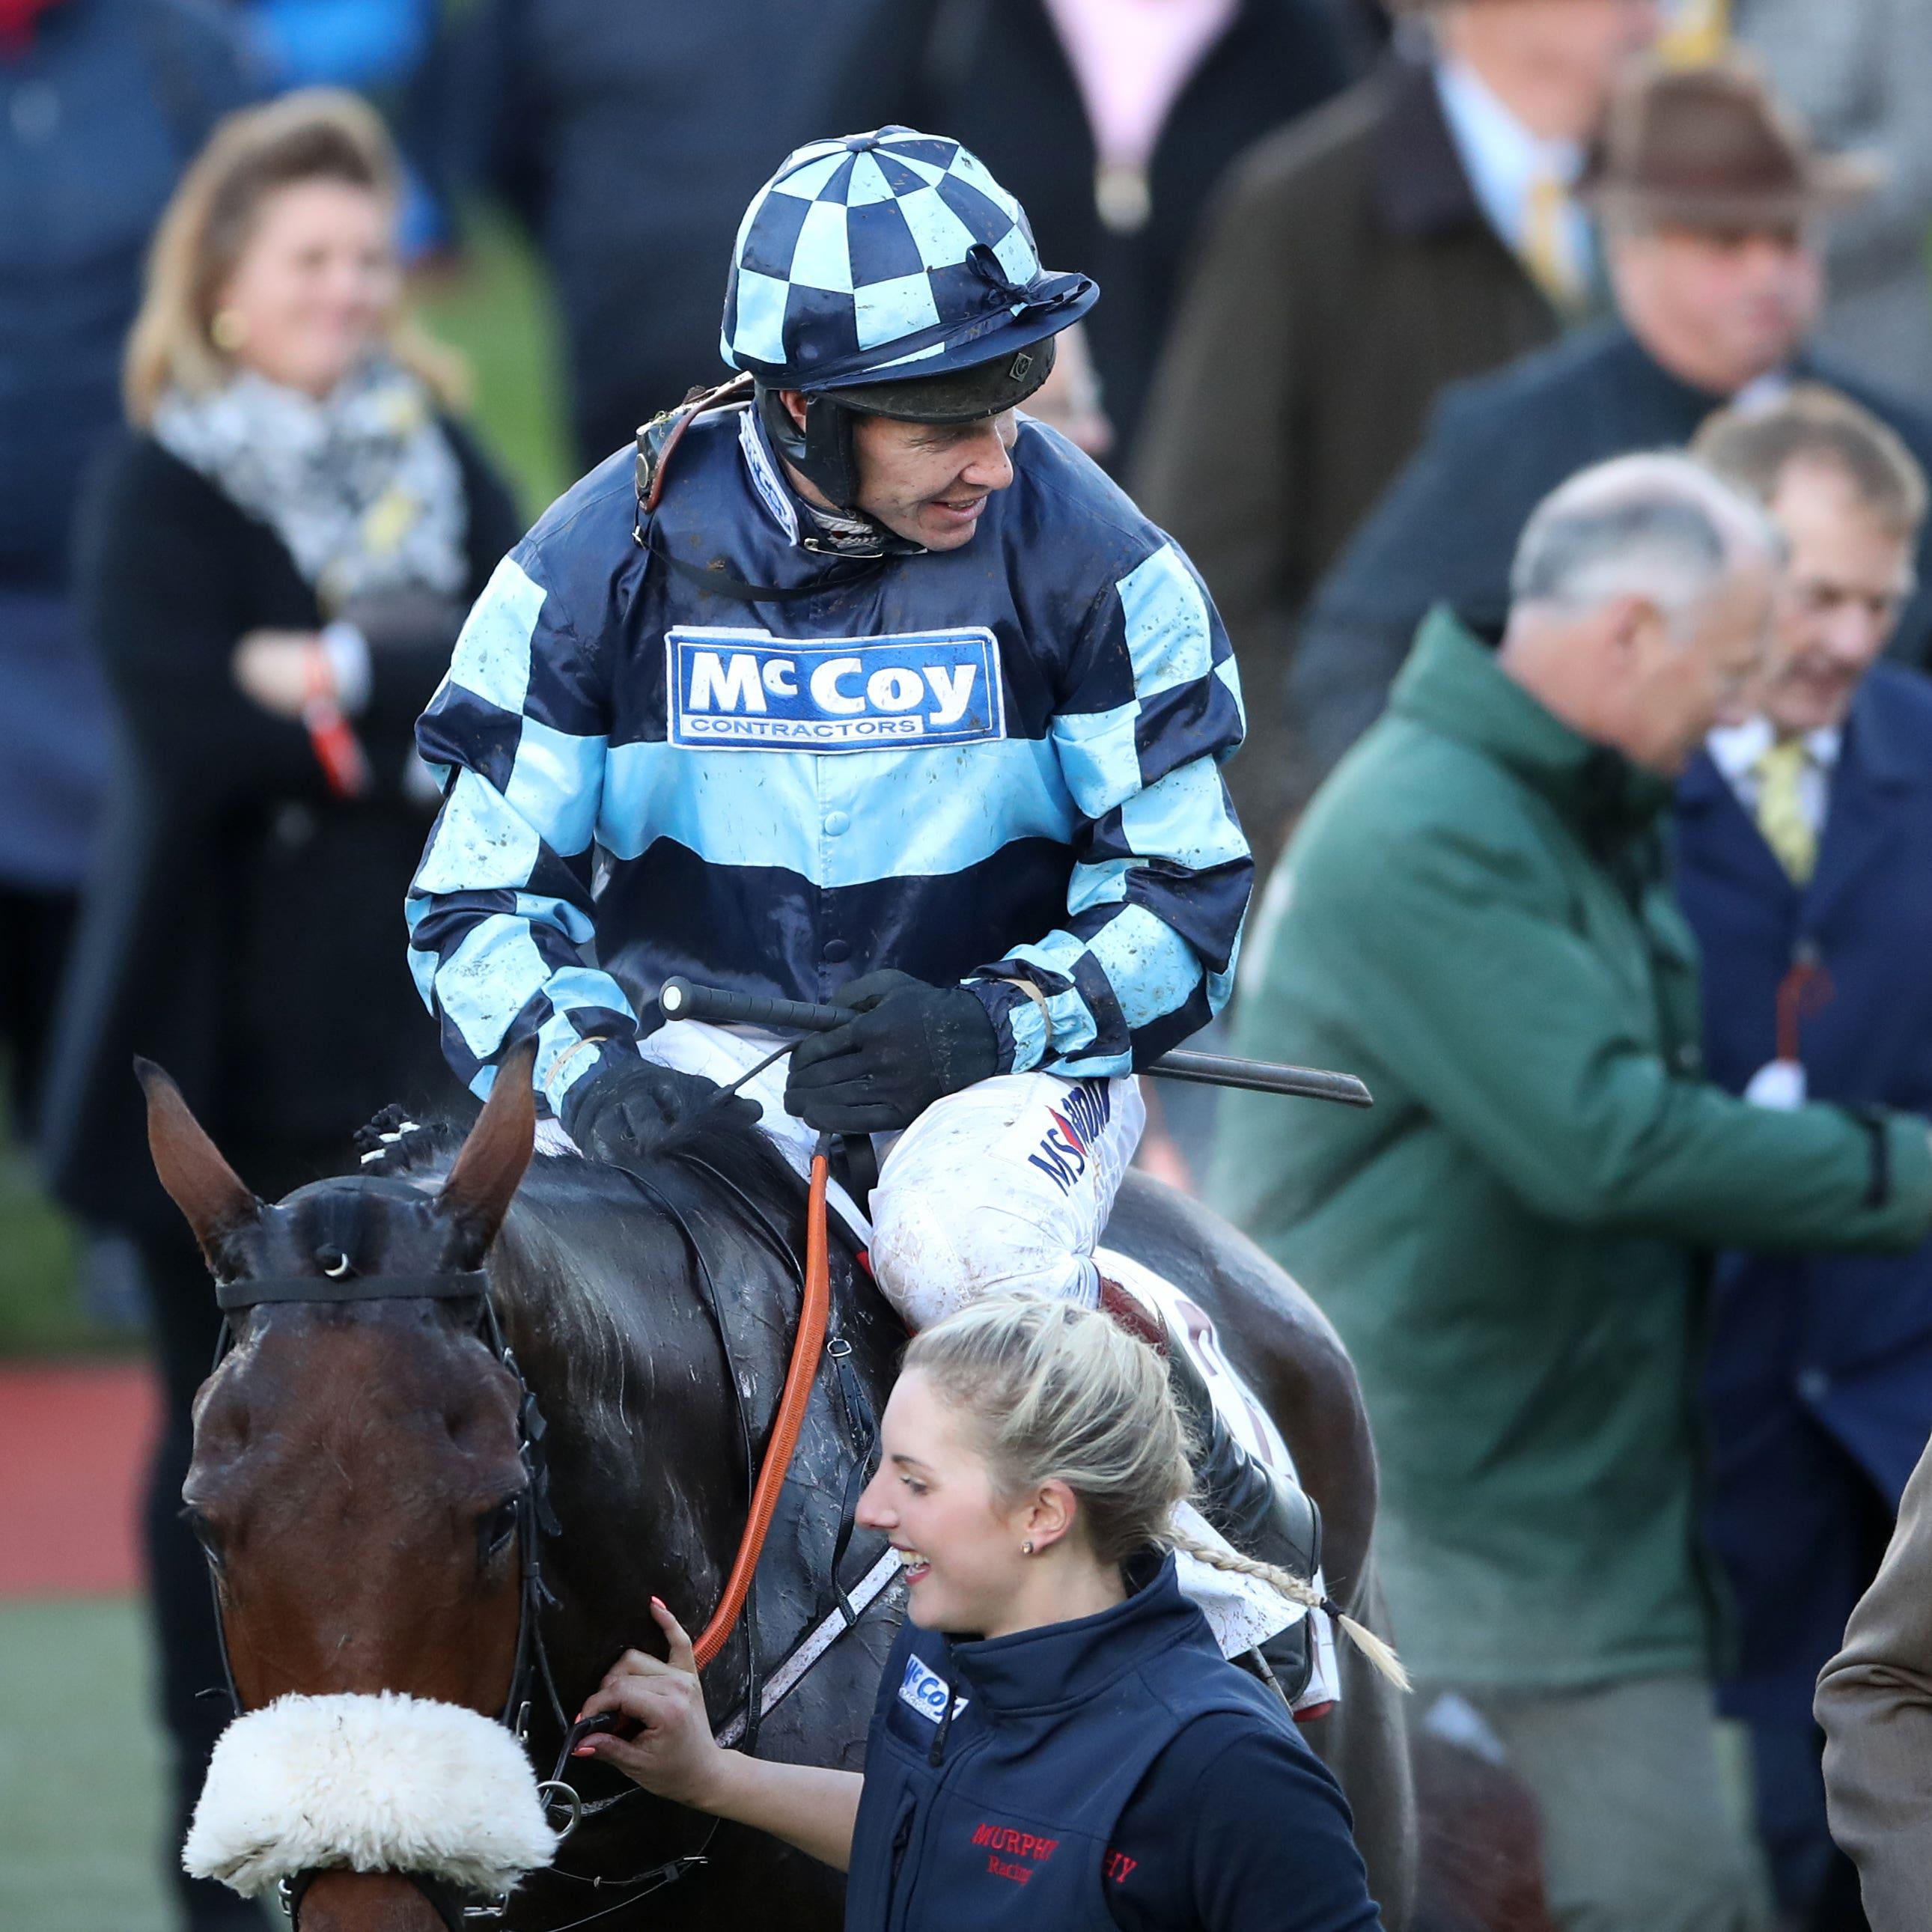 Thomas Darby returns after winning at Cheltenham